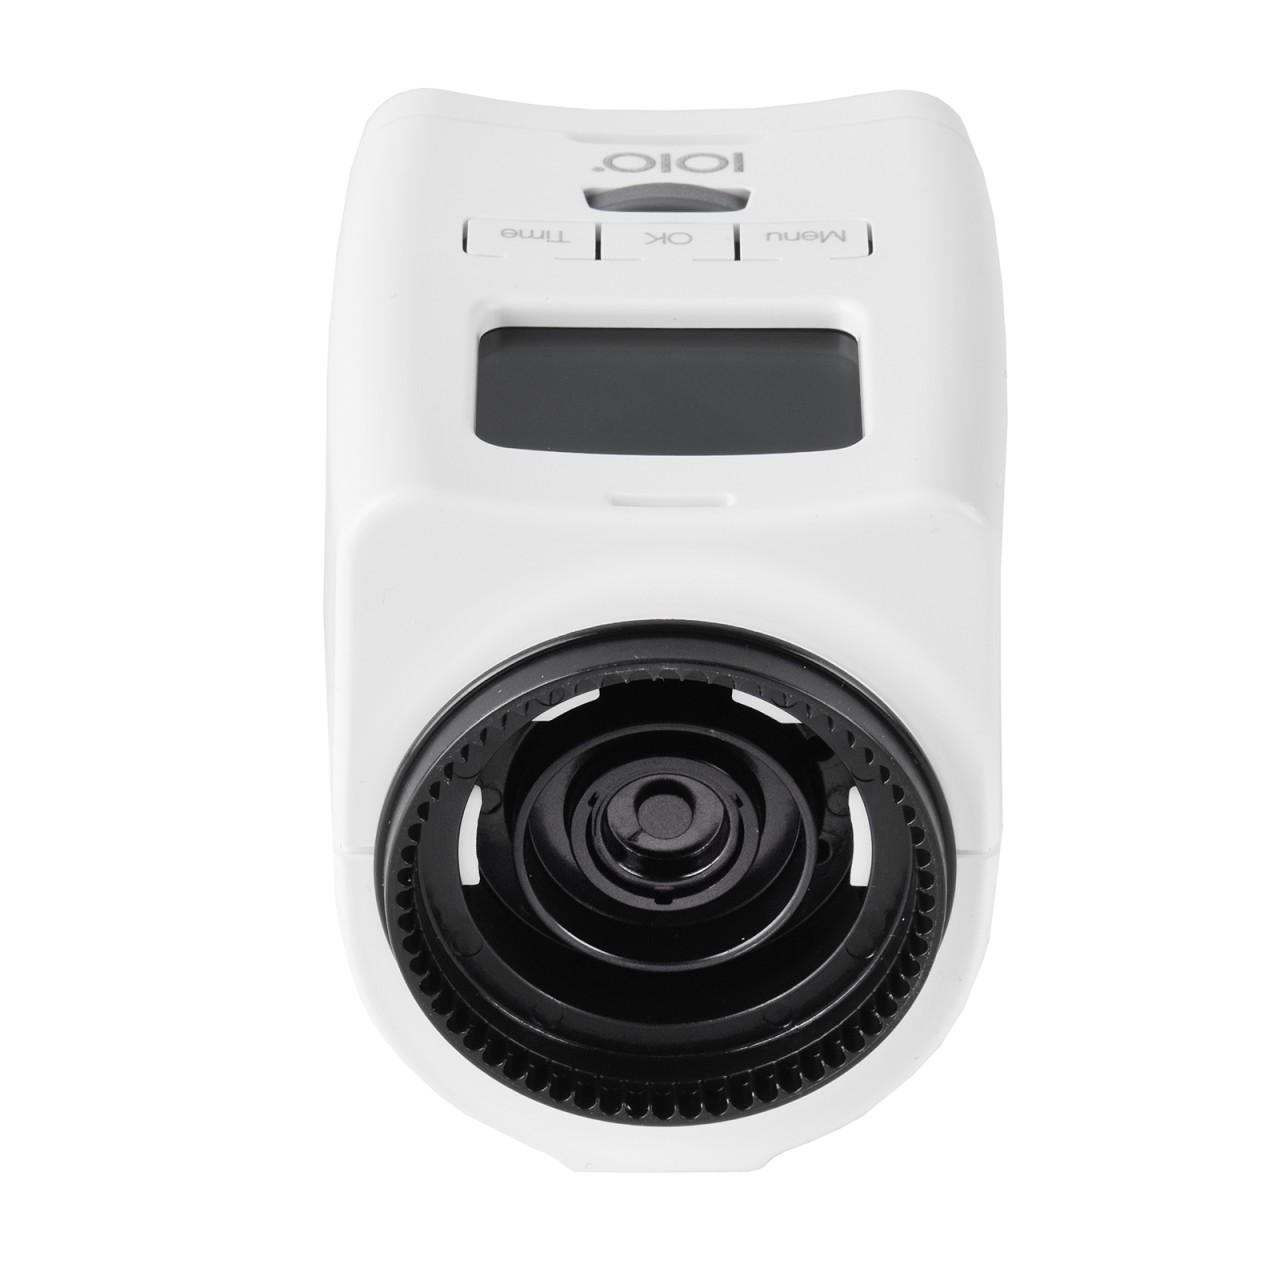 OLYMPIA Electronic radiator Thermostat HT 2000 – Bild 6 #626369